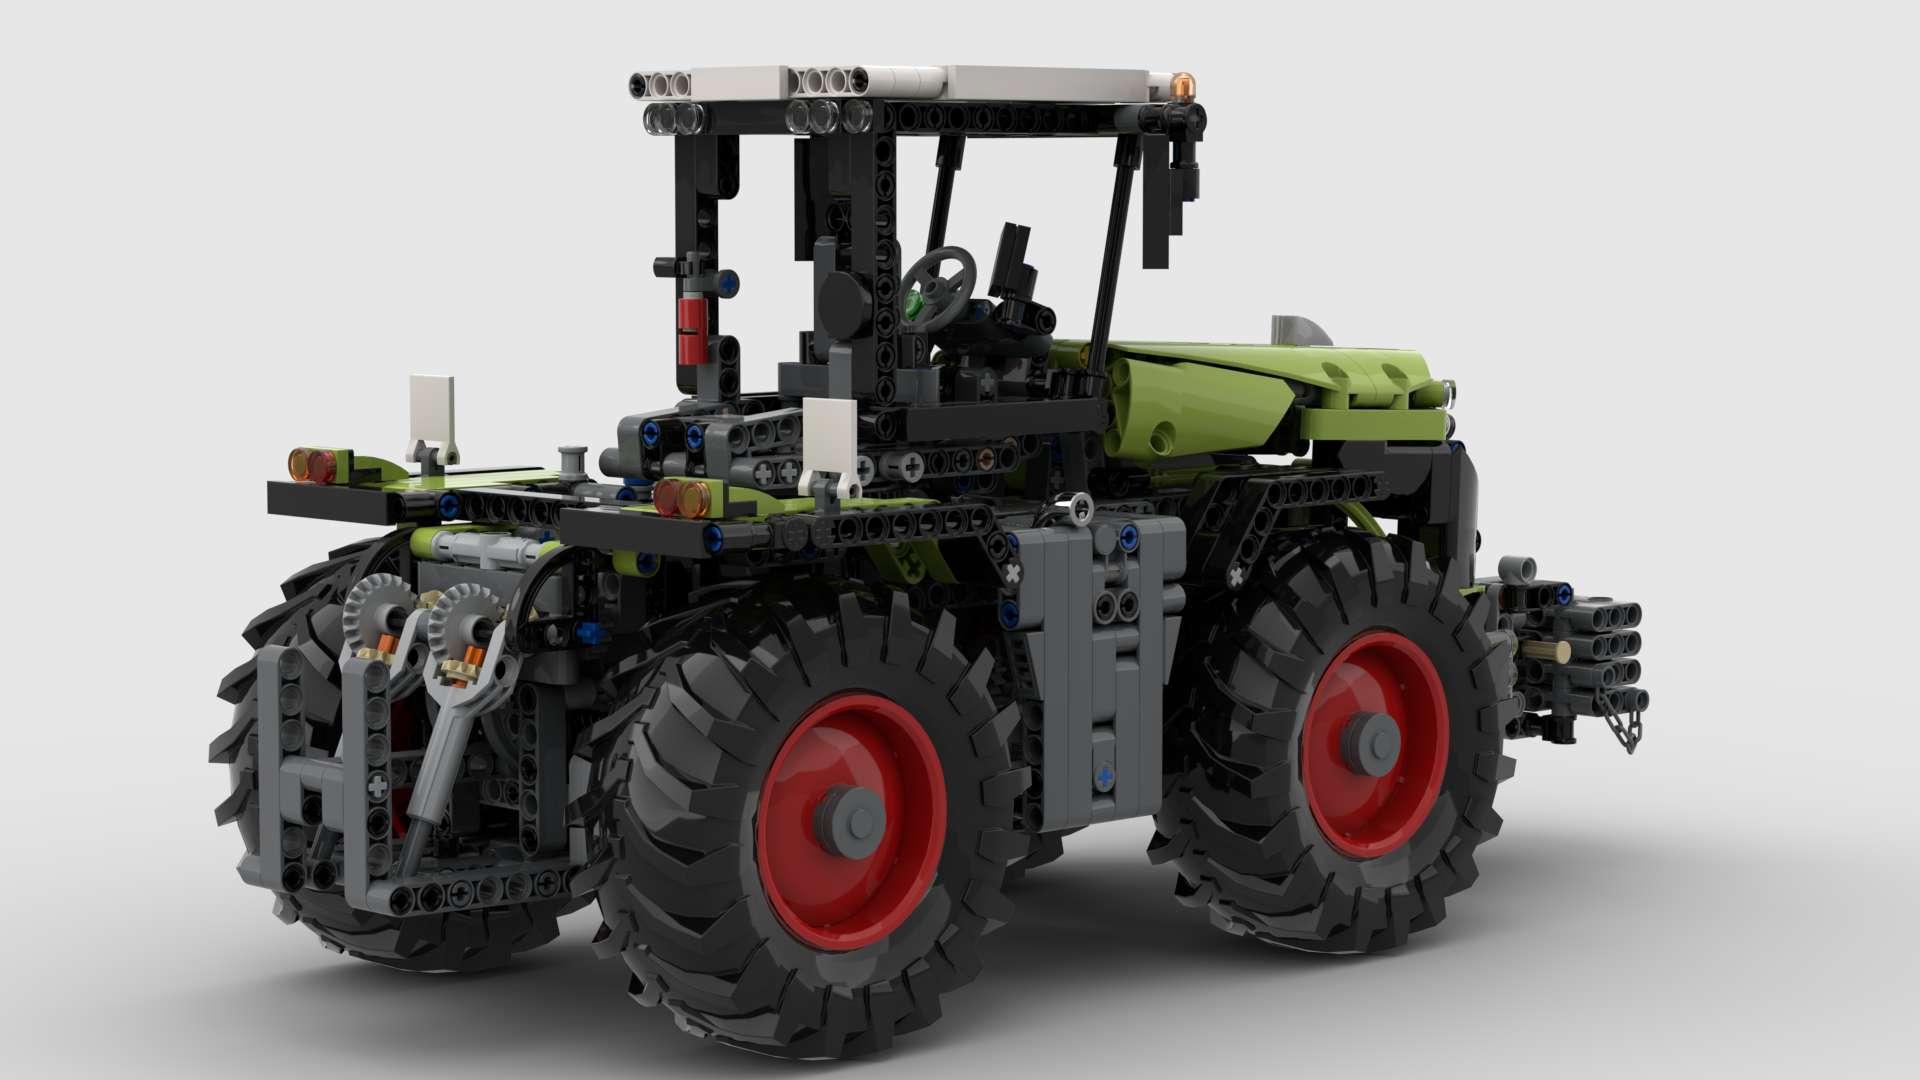 00 42054 Rc Original Xerion 5000 VC 7 Motoren MOD bilder